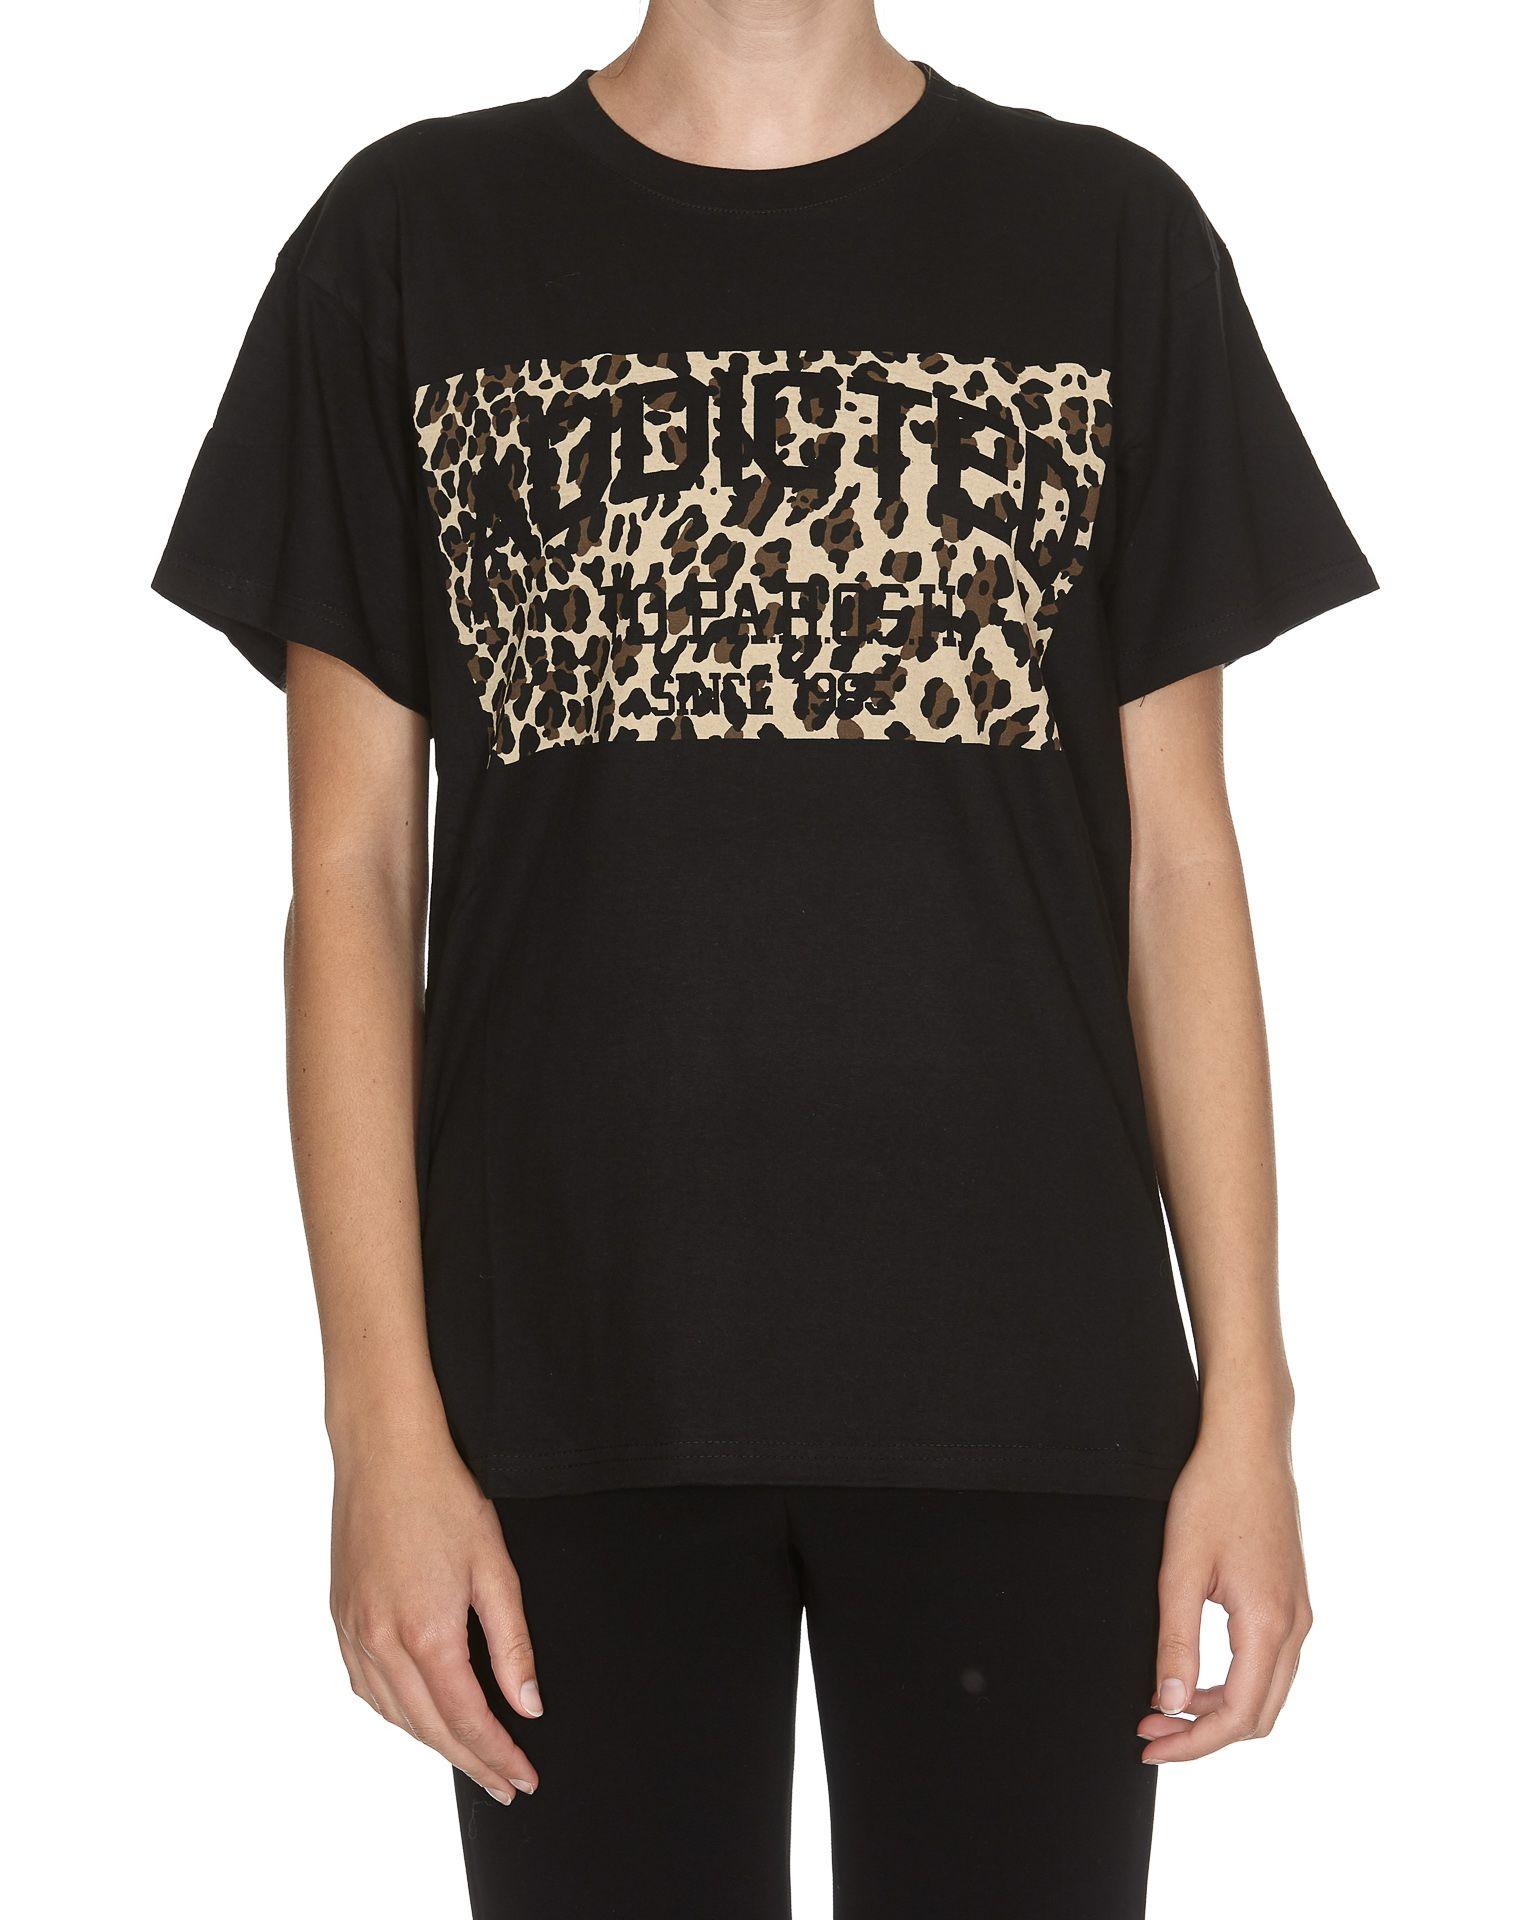 Parosh Coroar T-shirt